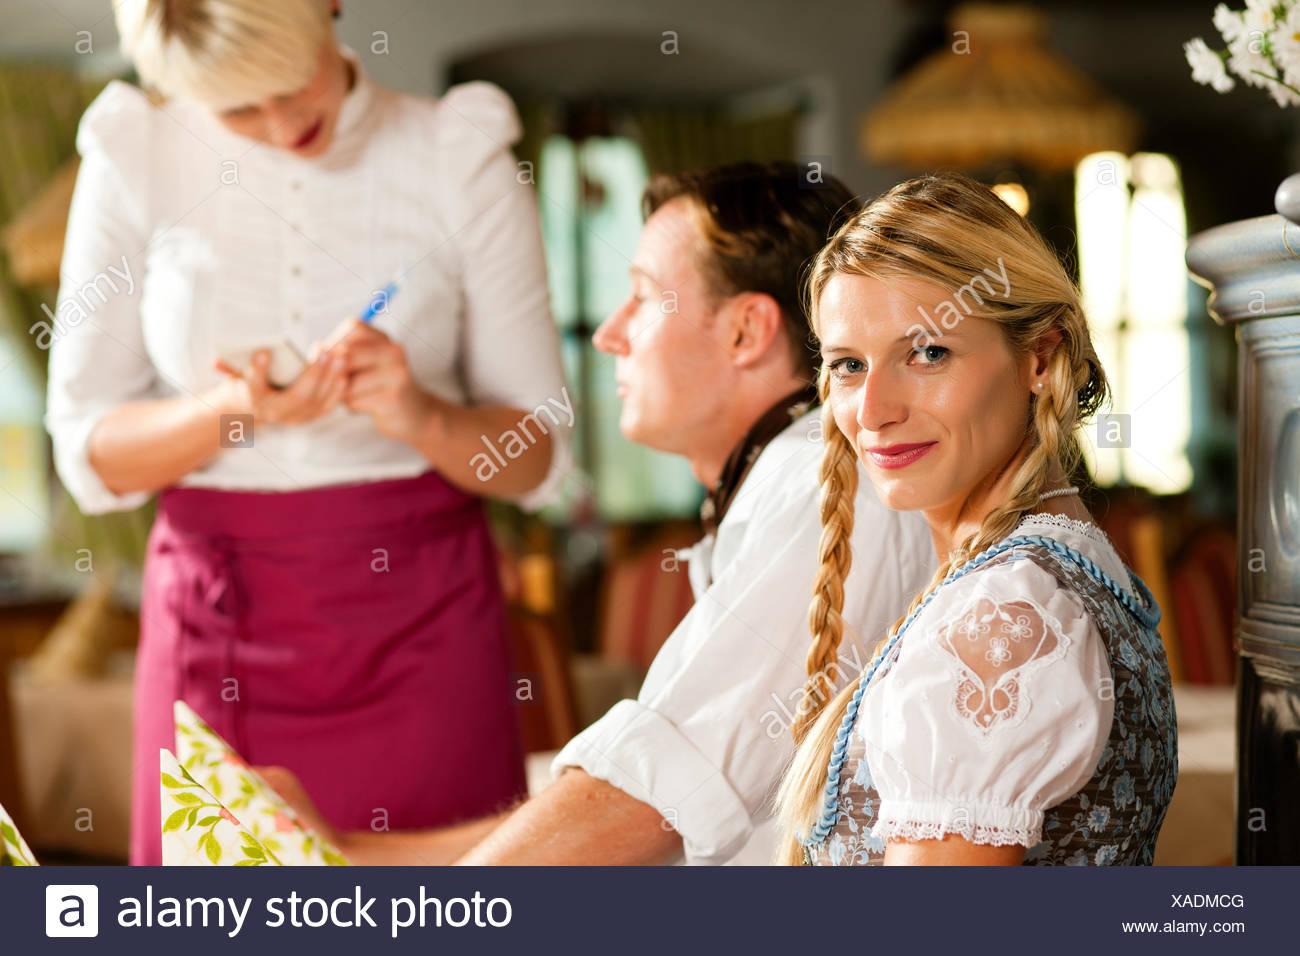 couple ordered in bavarian restaurant Stock Photo